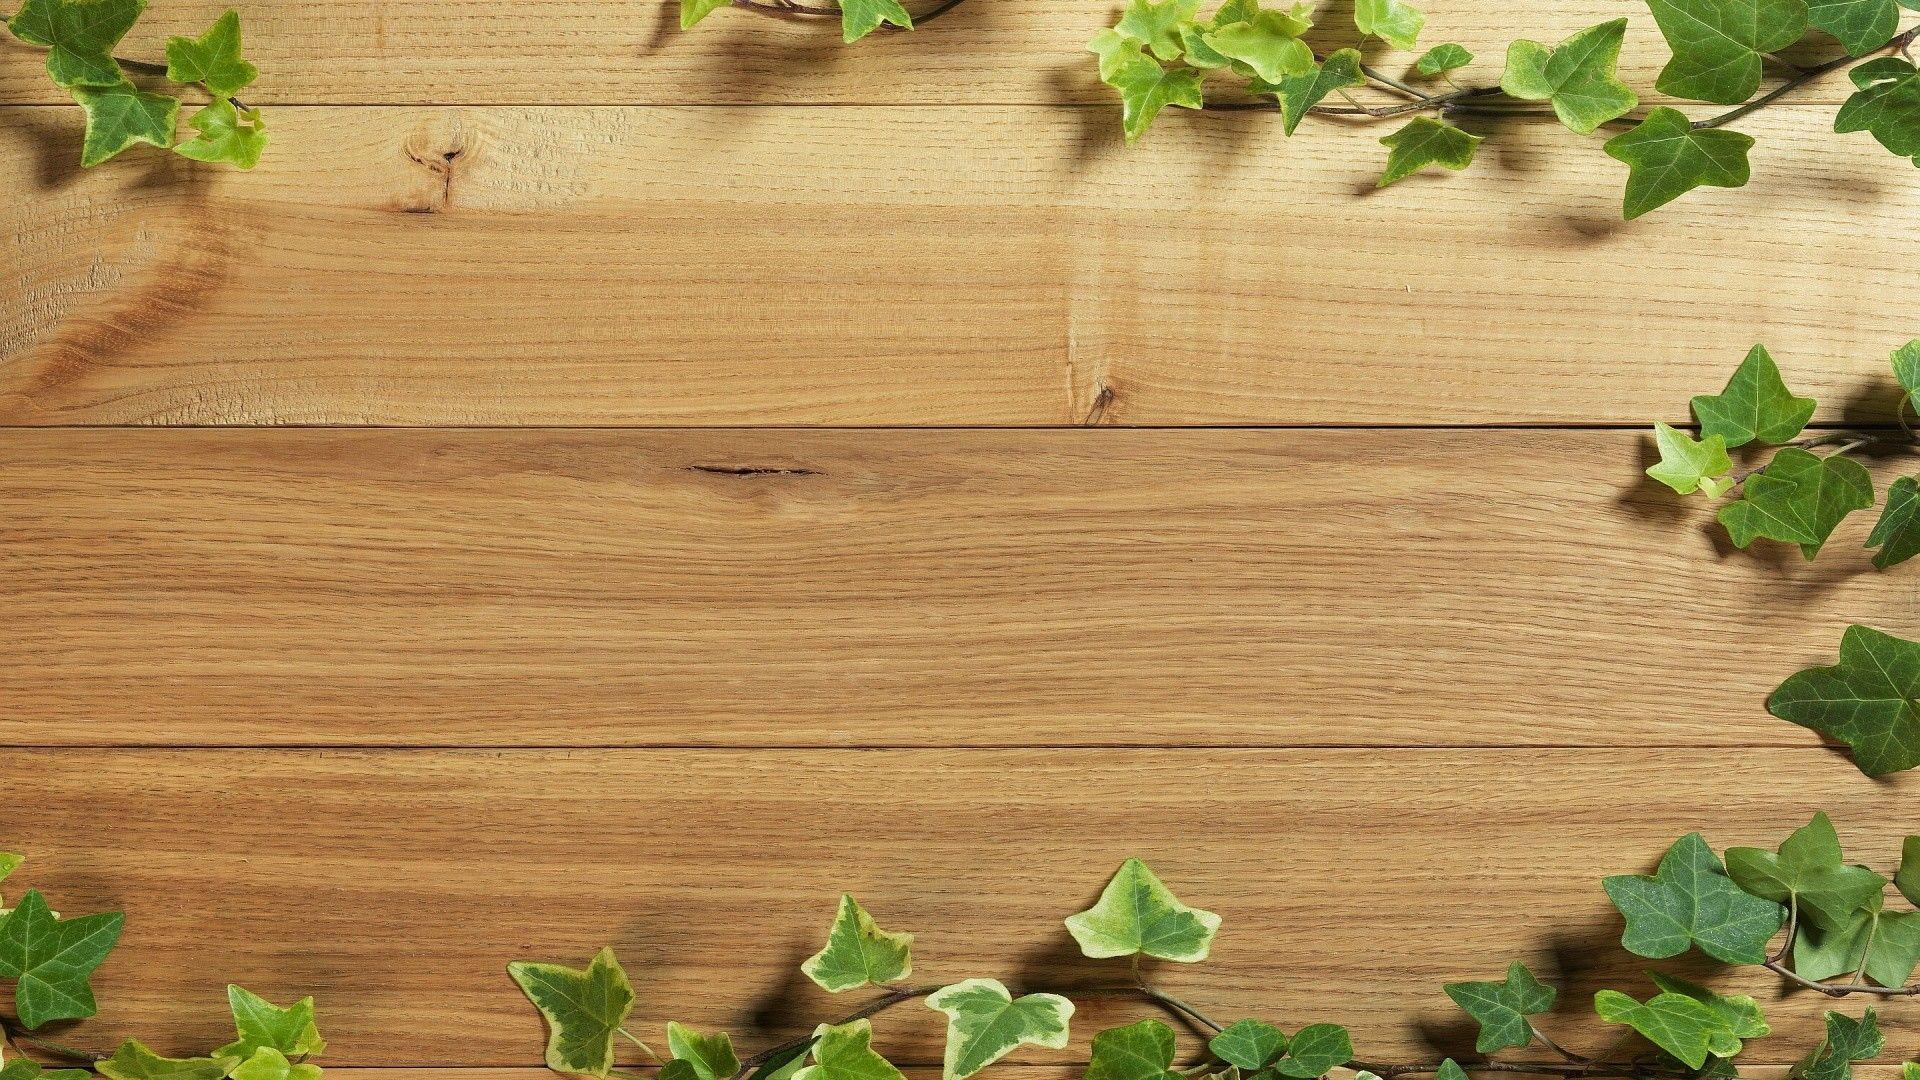 1920x1080 Full Hd 1080p Textures Wallpapers Desktop Backgrounds Hd Wood Wood Wallpaper Plant Wallpaper Desktop Wallpaper